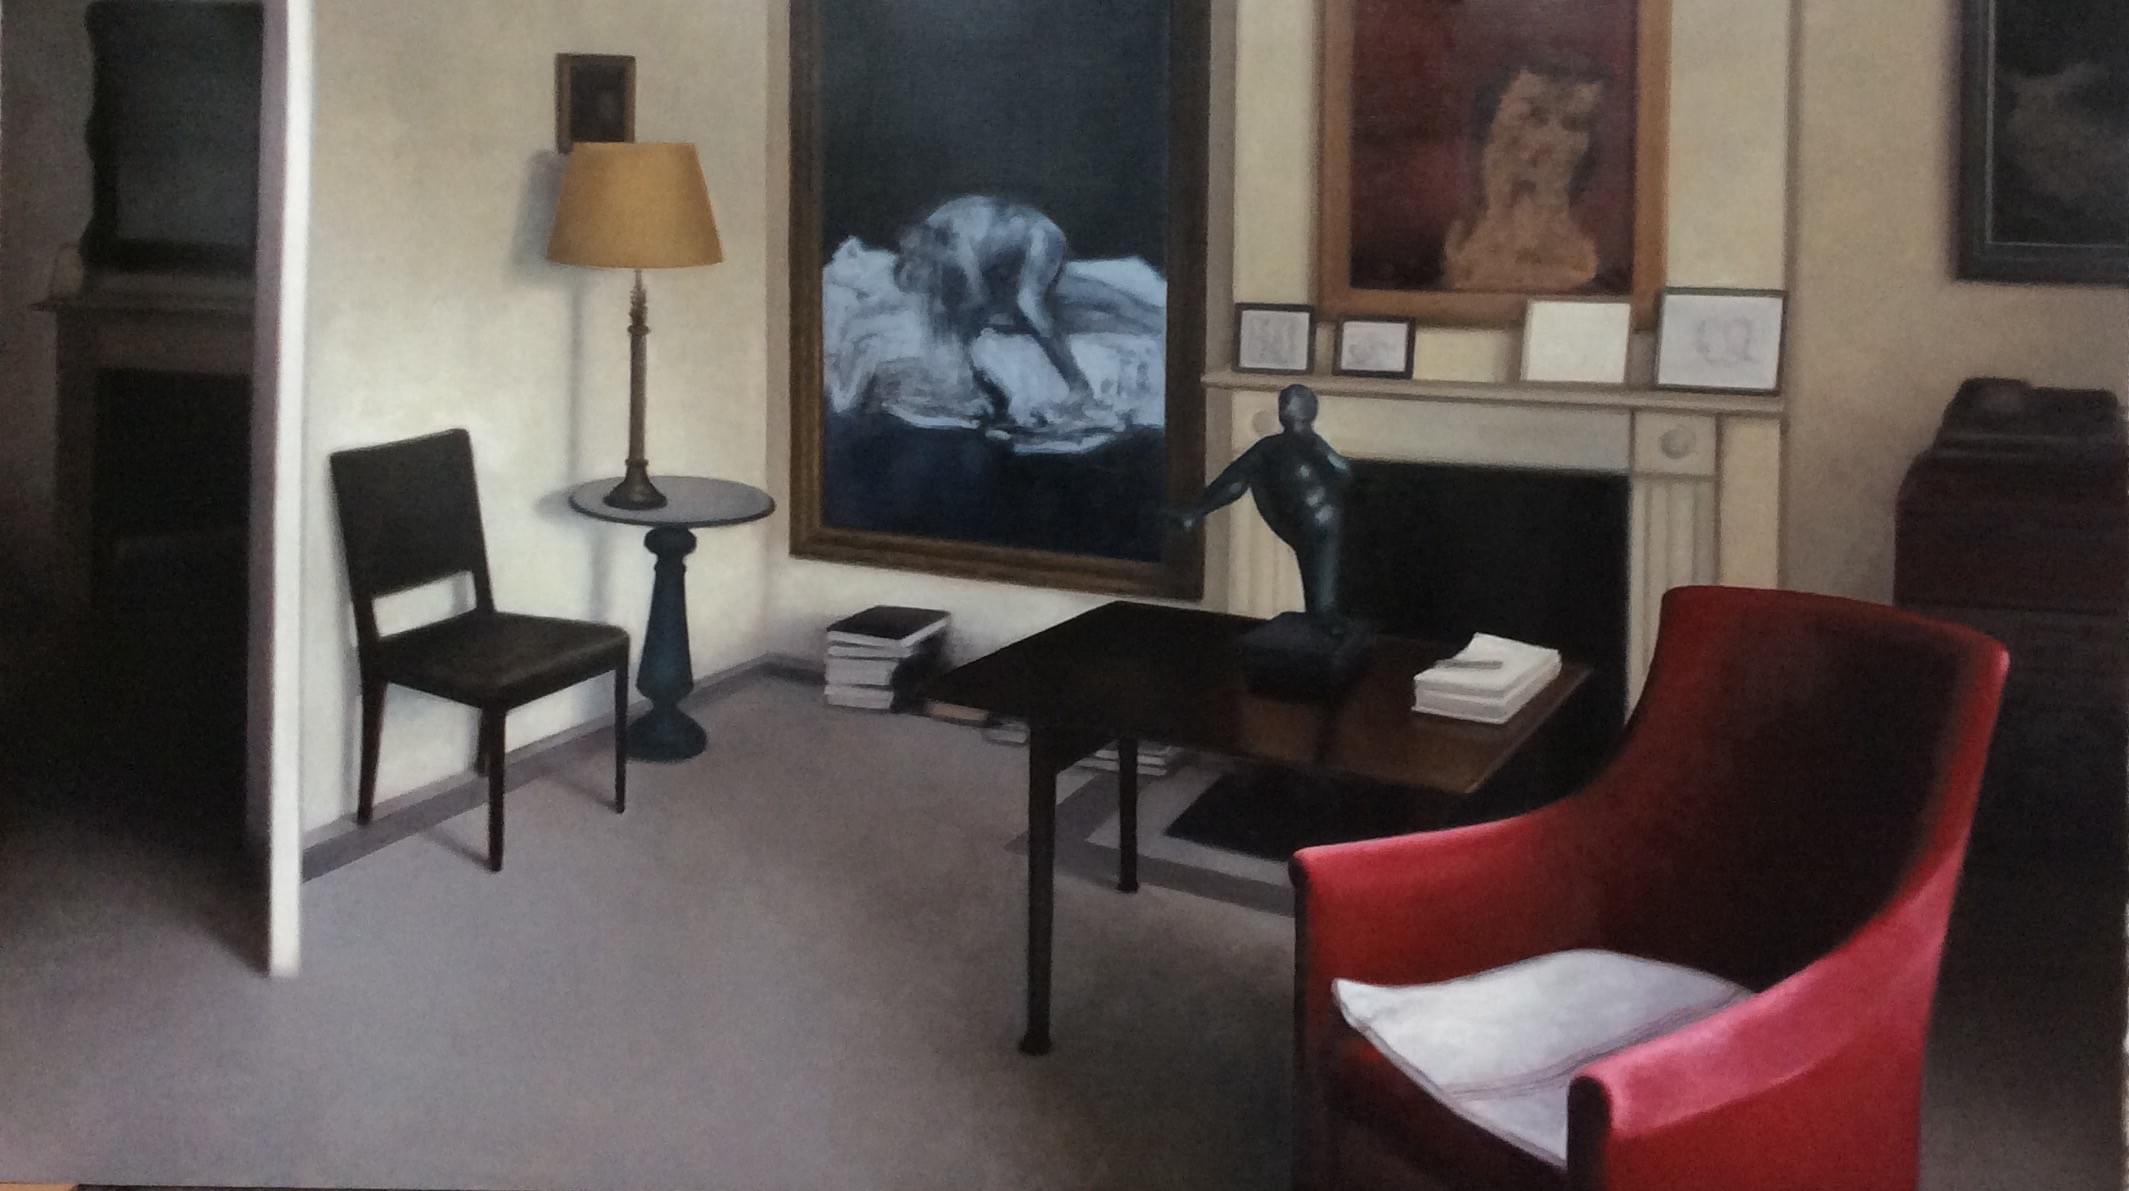 SC461. Dormitorio de Lucian en Kensington II Óleo sobre papel 140 x 240 cm 2016